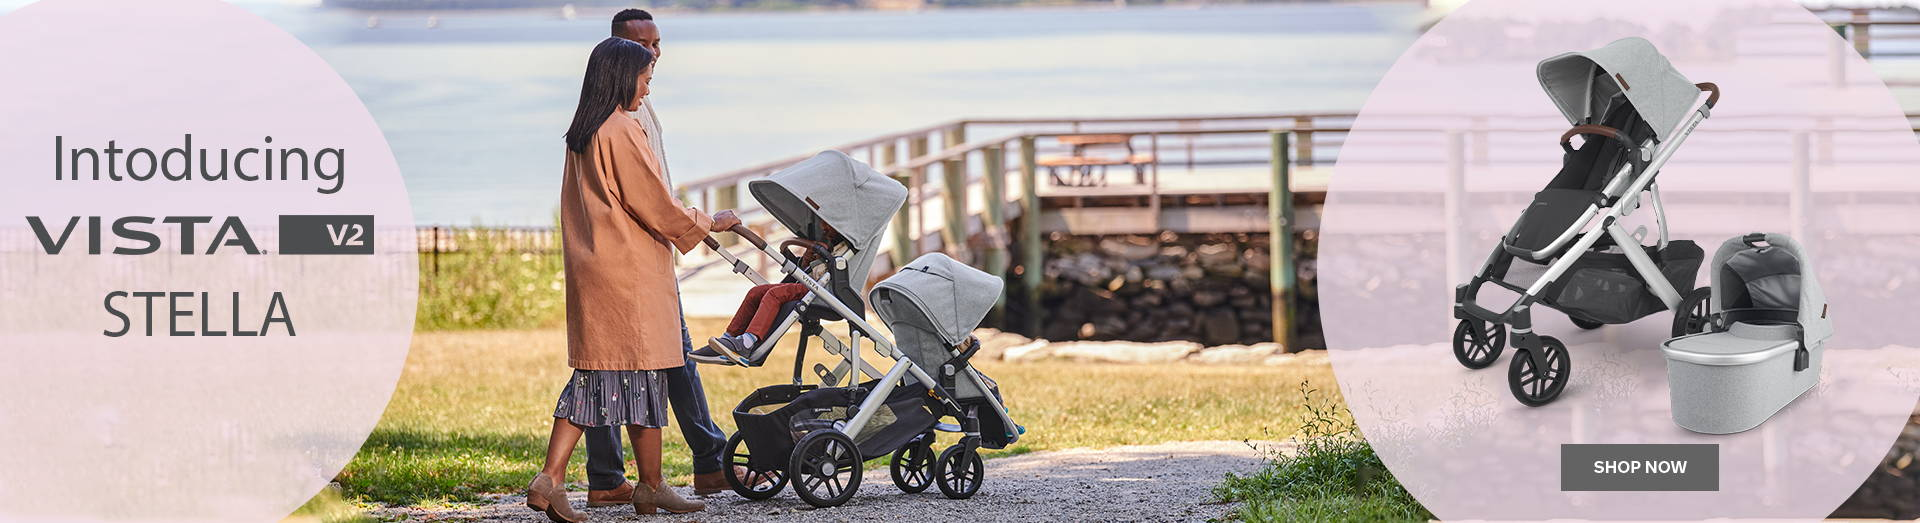 introducing Vista V2 Stella baby stroller, baby gear, Kidsland